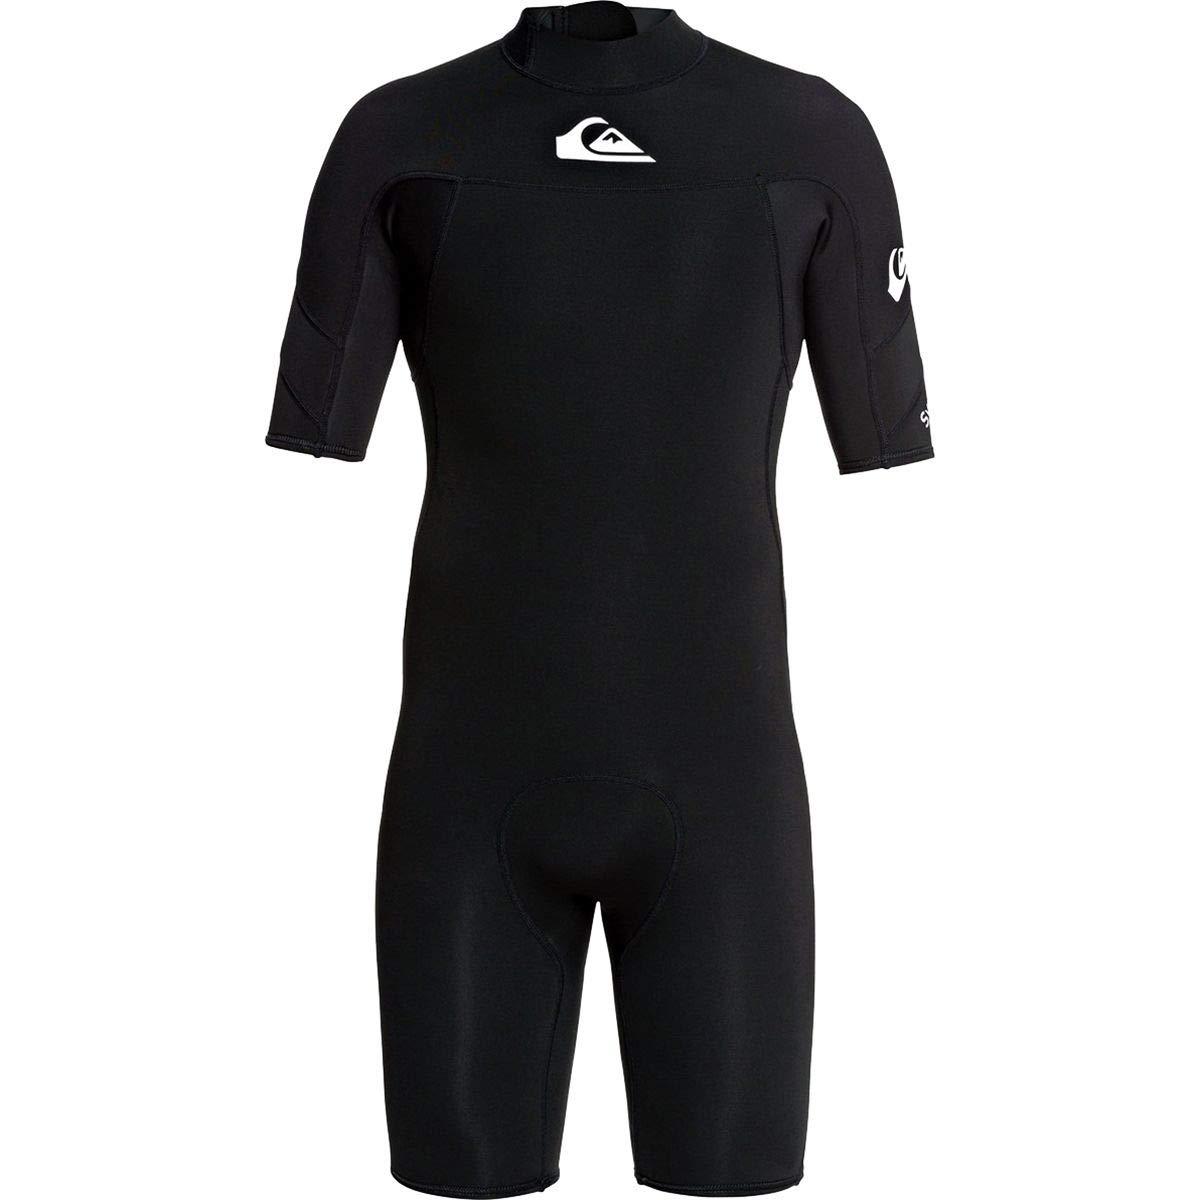 Quiksilver Men's 2/2mm Syncro Short Sleeve Back Zip FLT Springsuit Black/White XL by Quiksilver